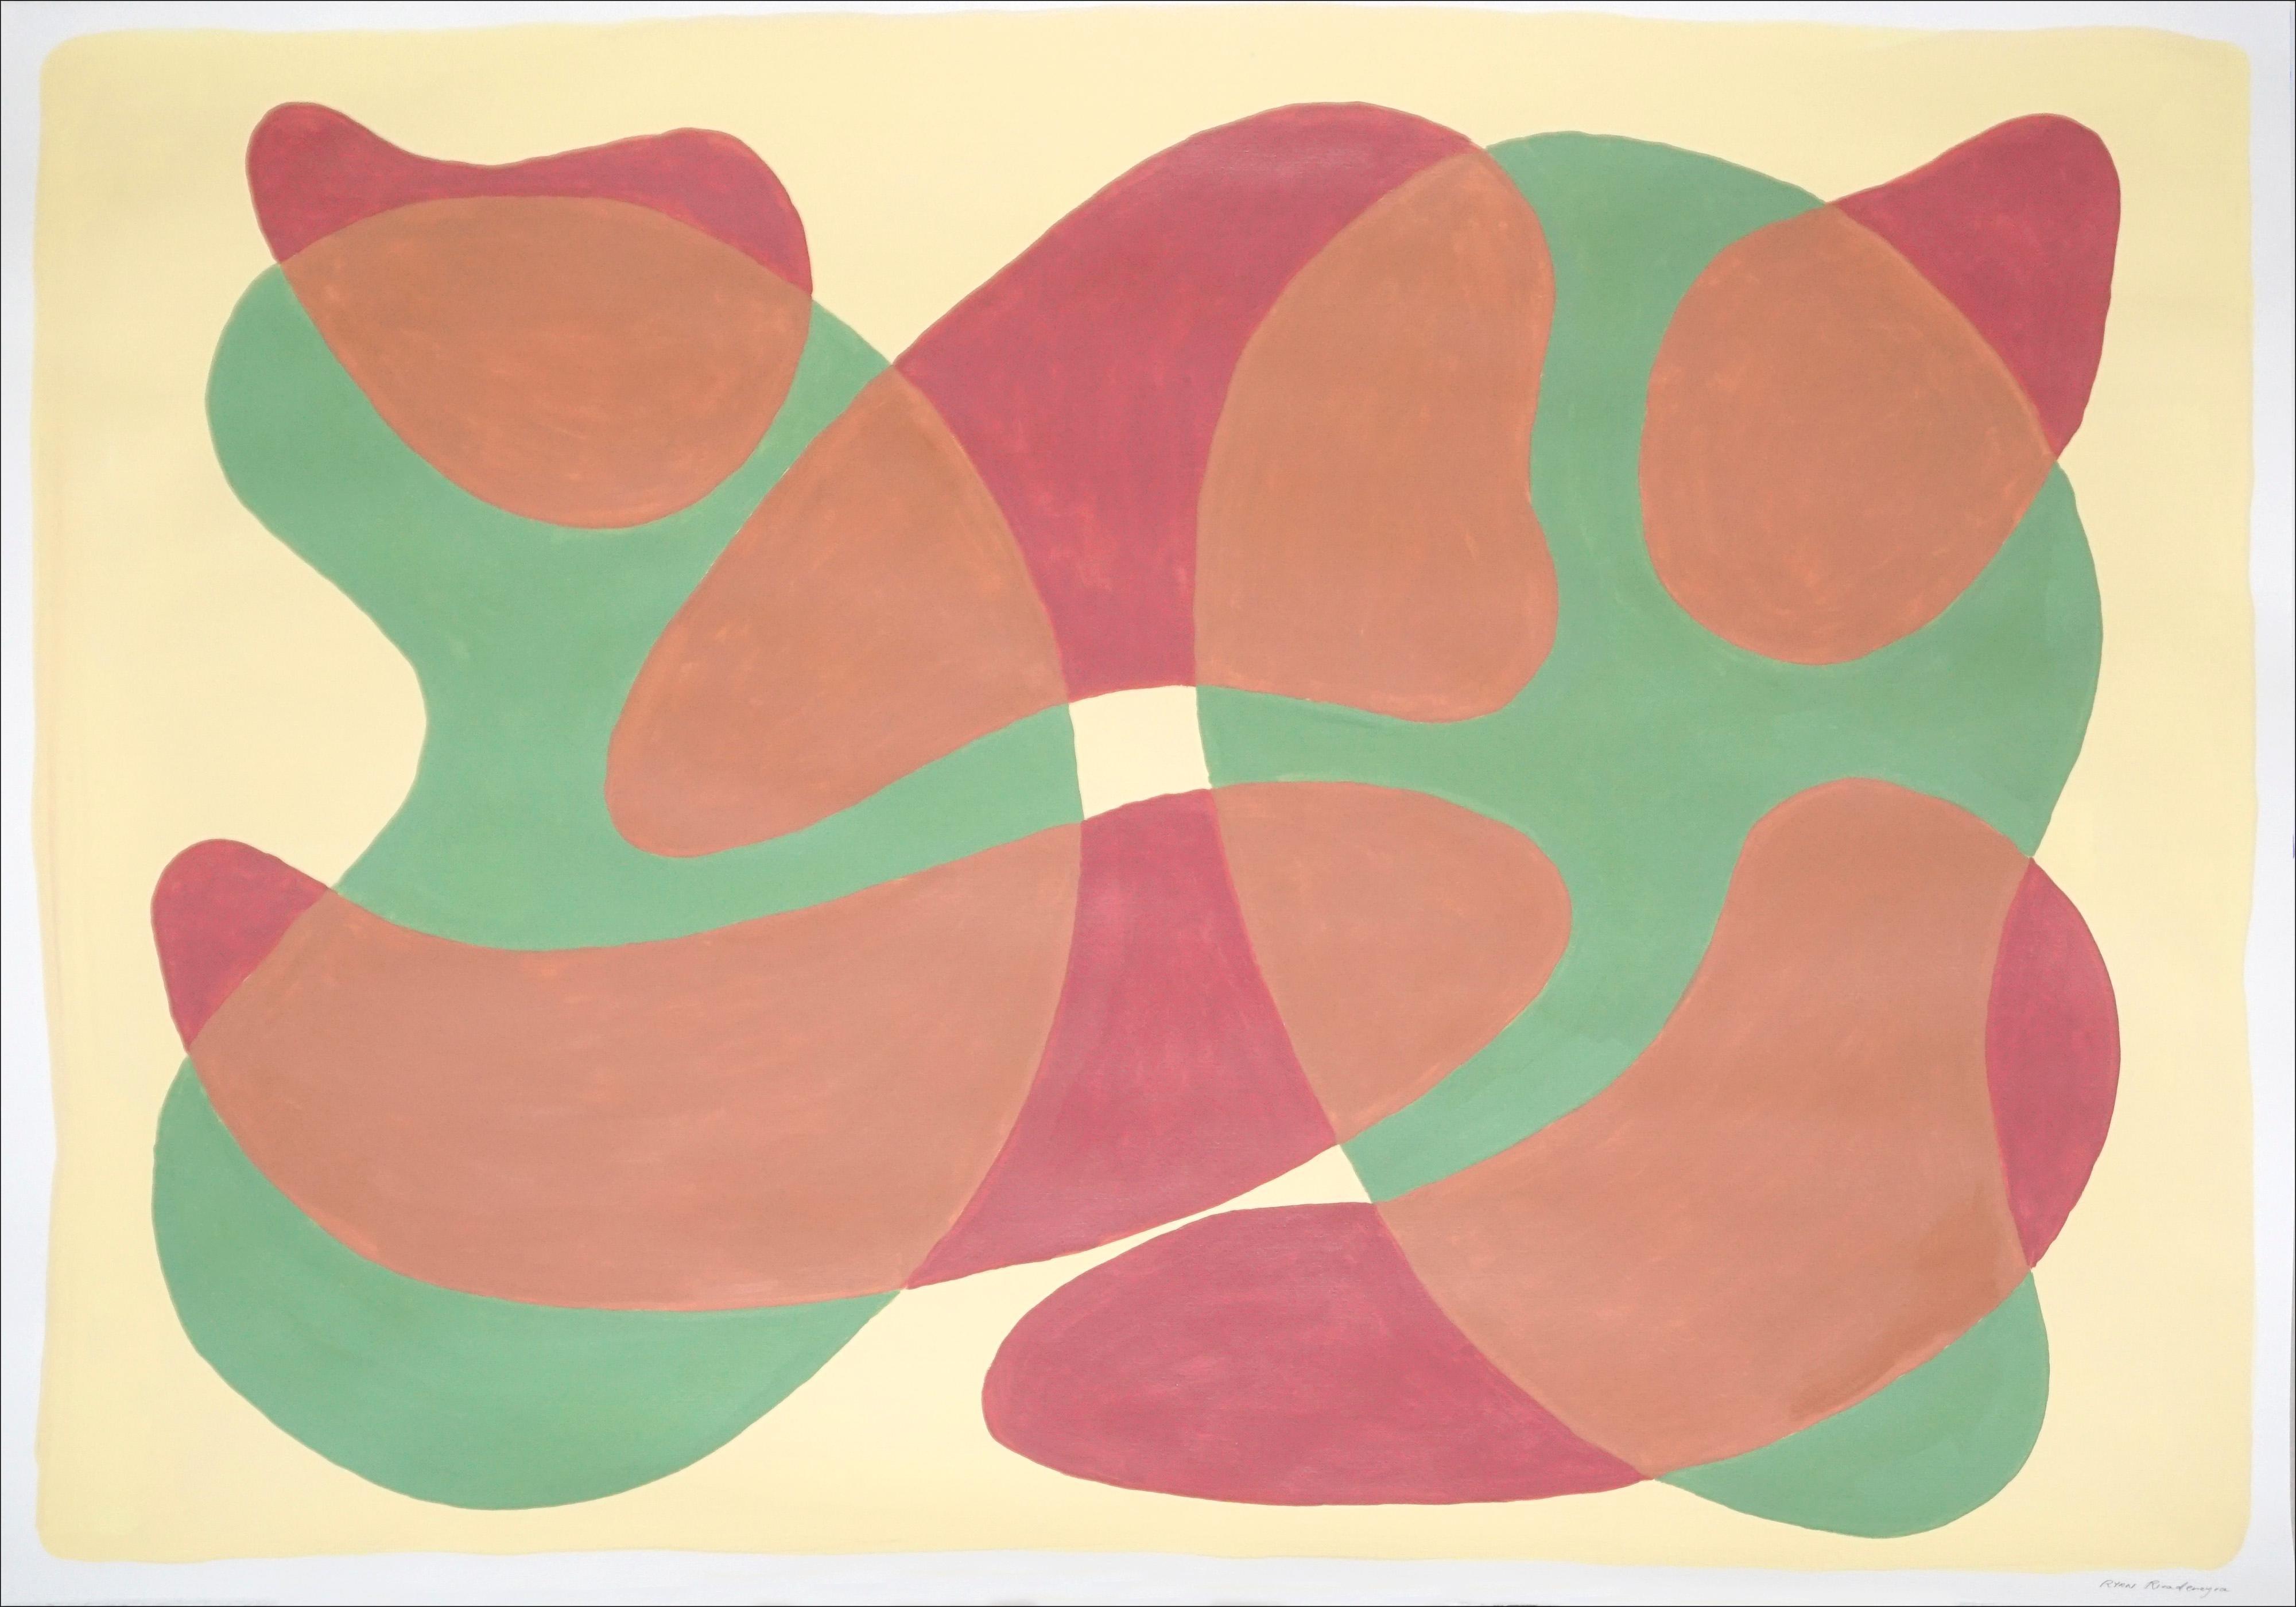 Large Painting of Mid-Century Translucent Shapes, Warm Tones Layers on Vanilla